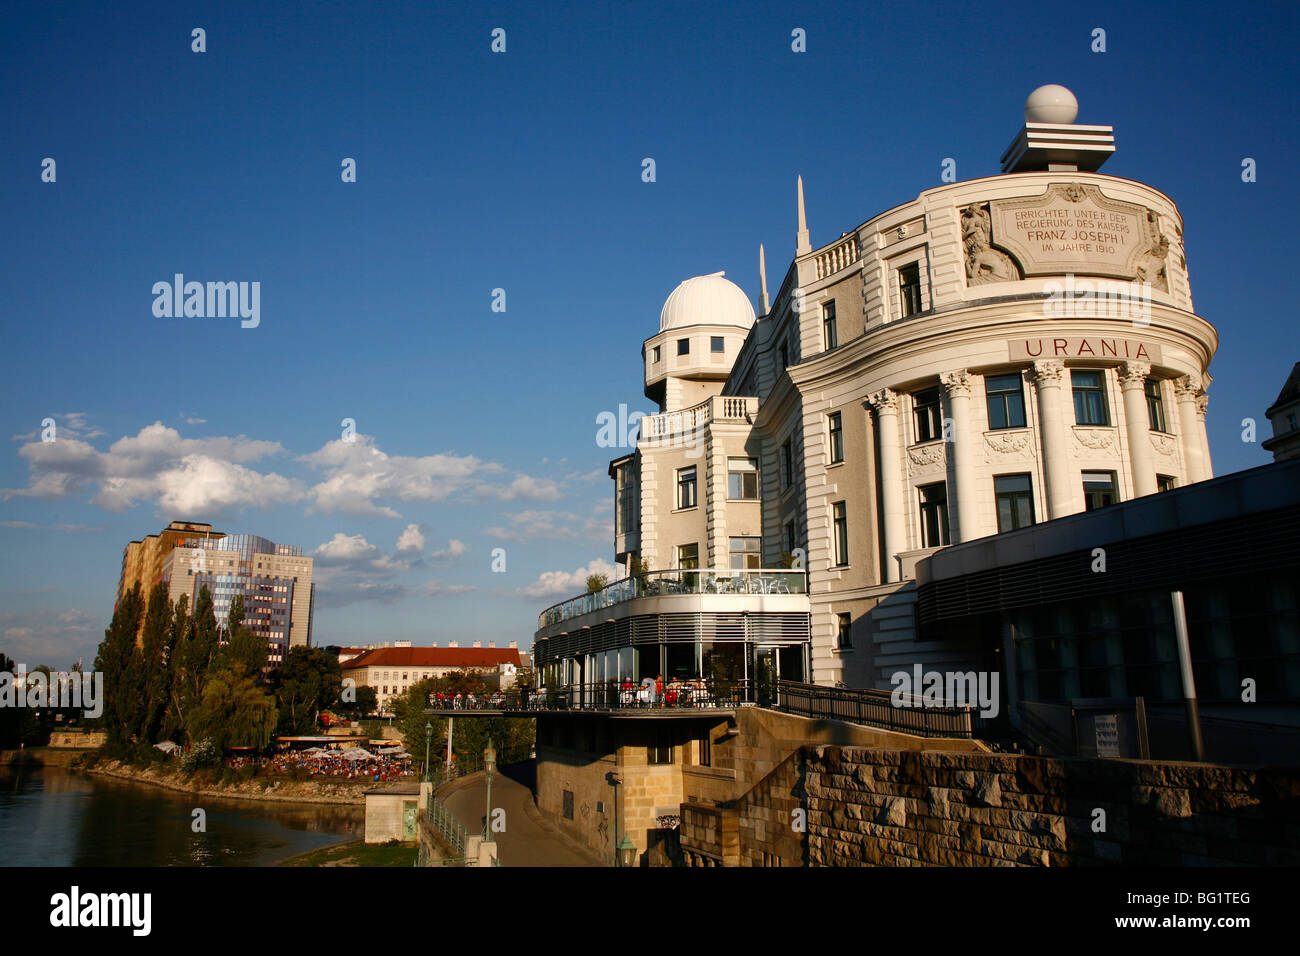 Osservatorio Urania, Vienna, Austria, Europa Immagini Stock